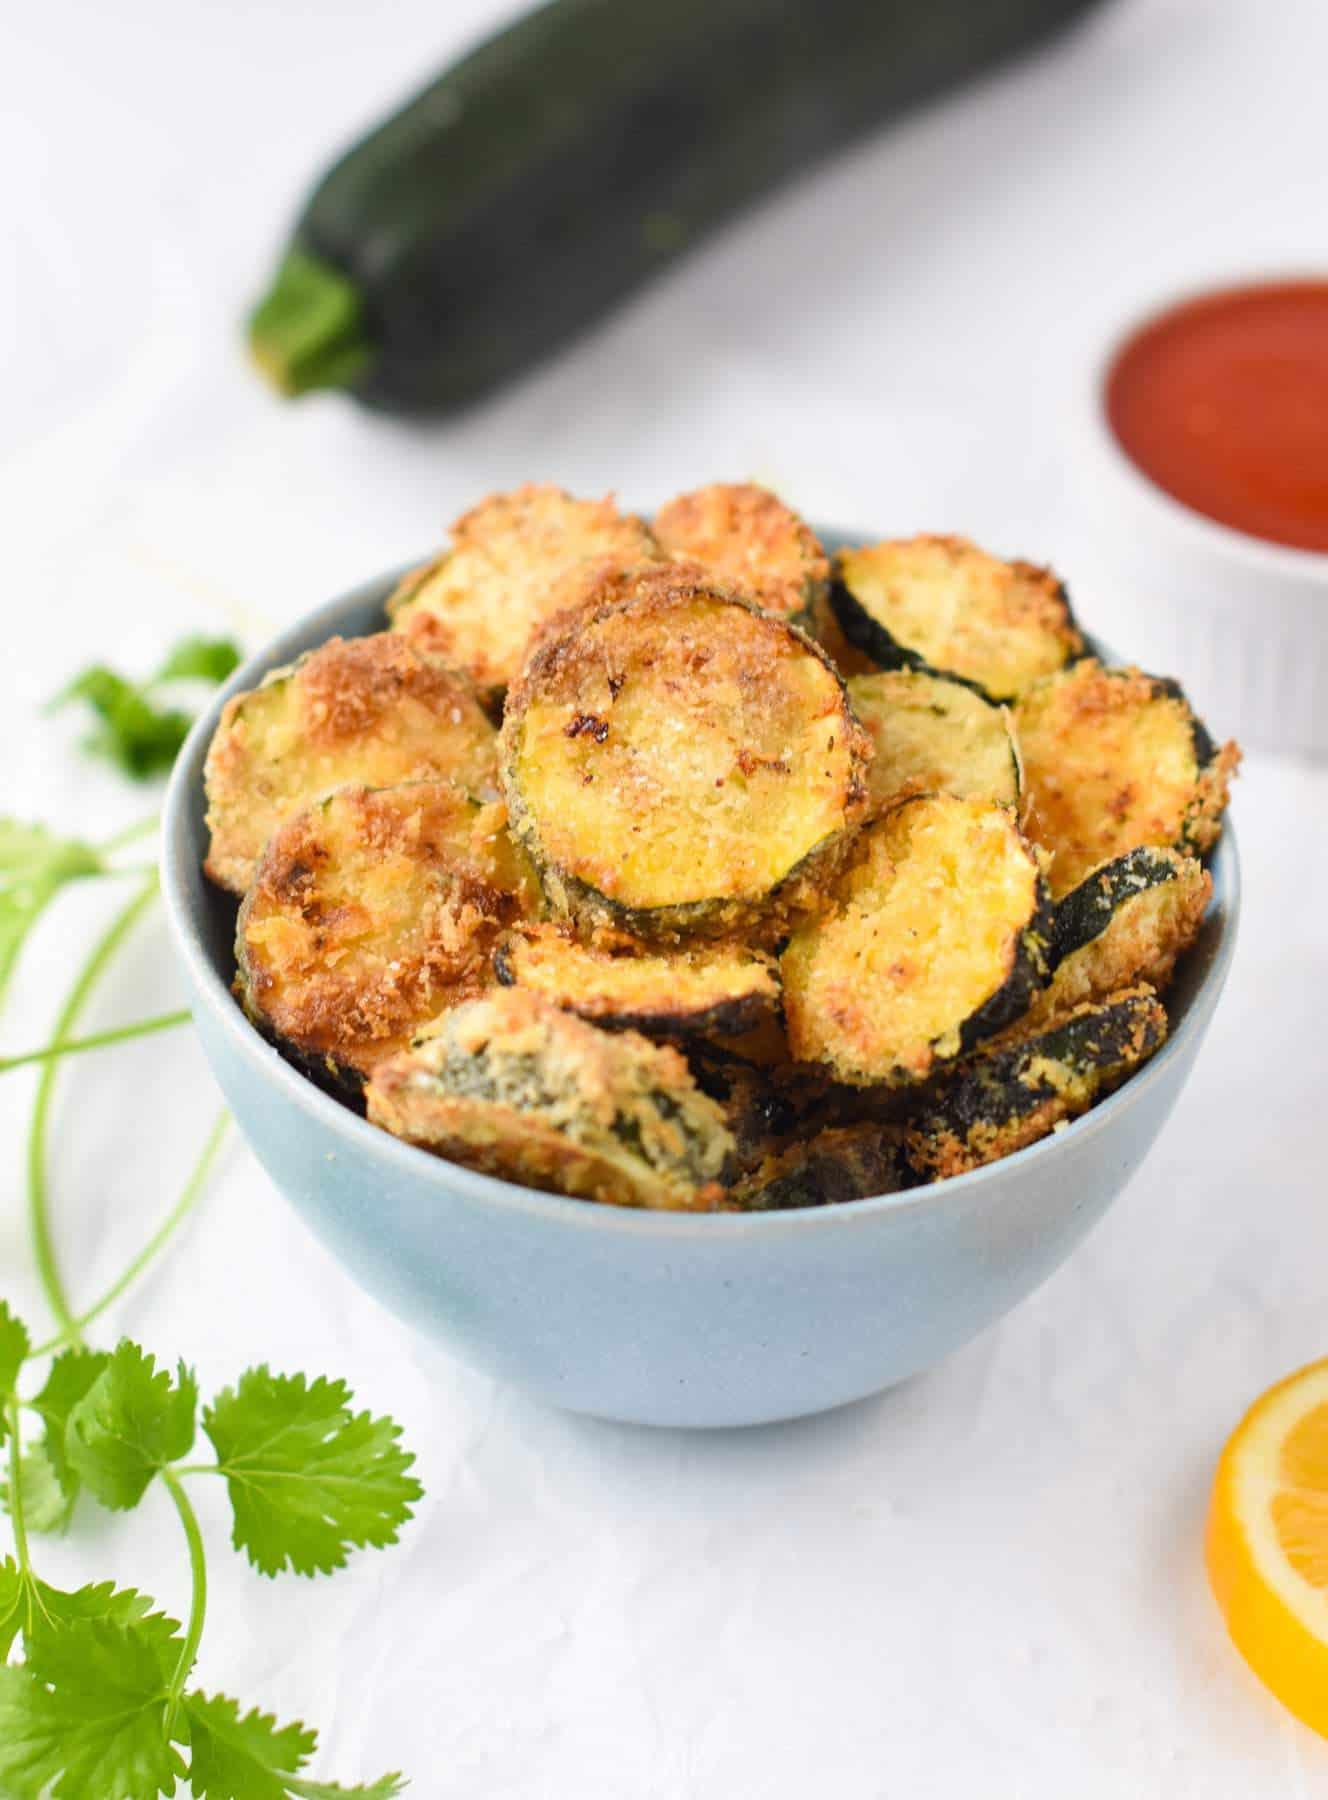 Vegan Air Fryer Zucchini Chips Recipe